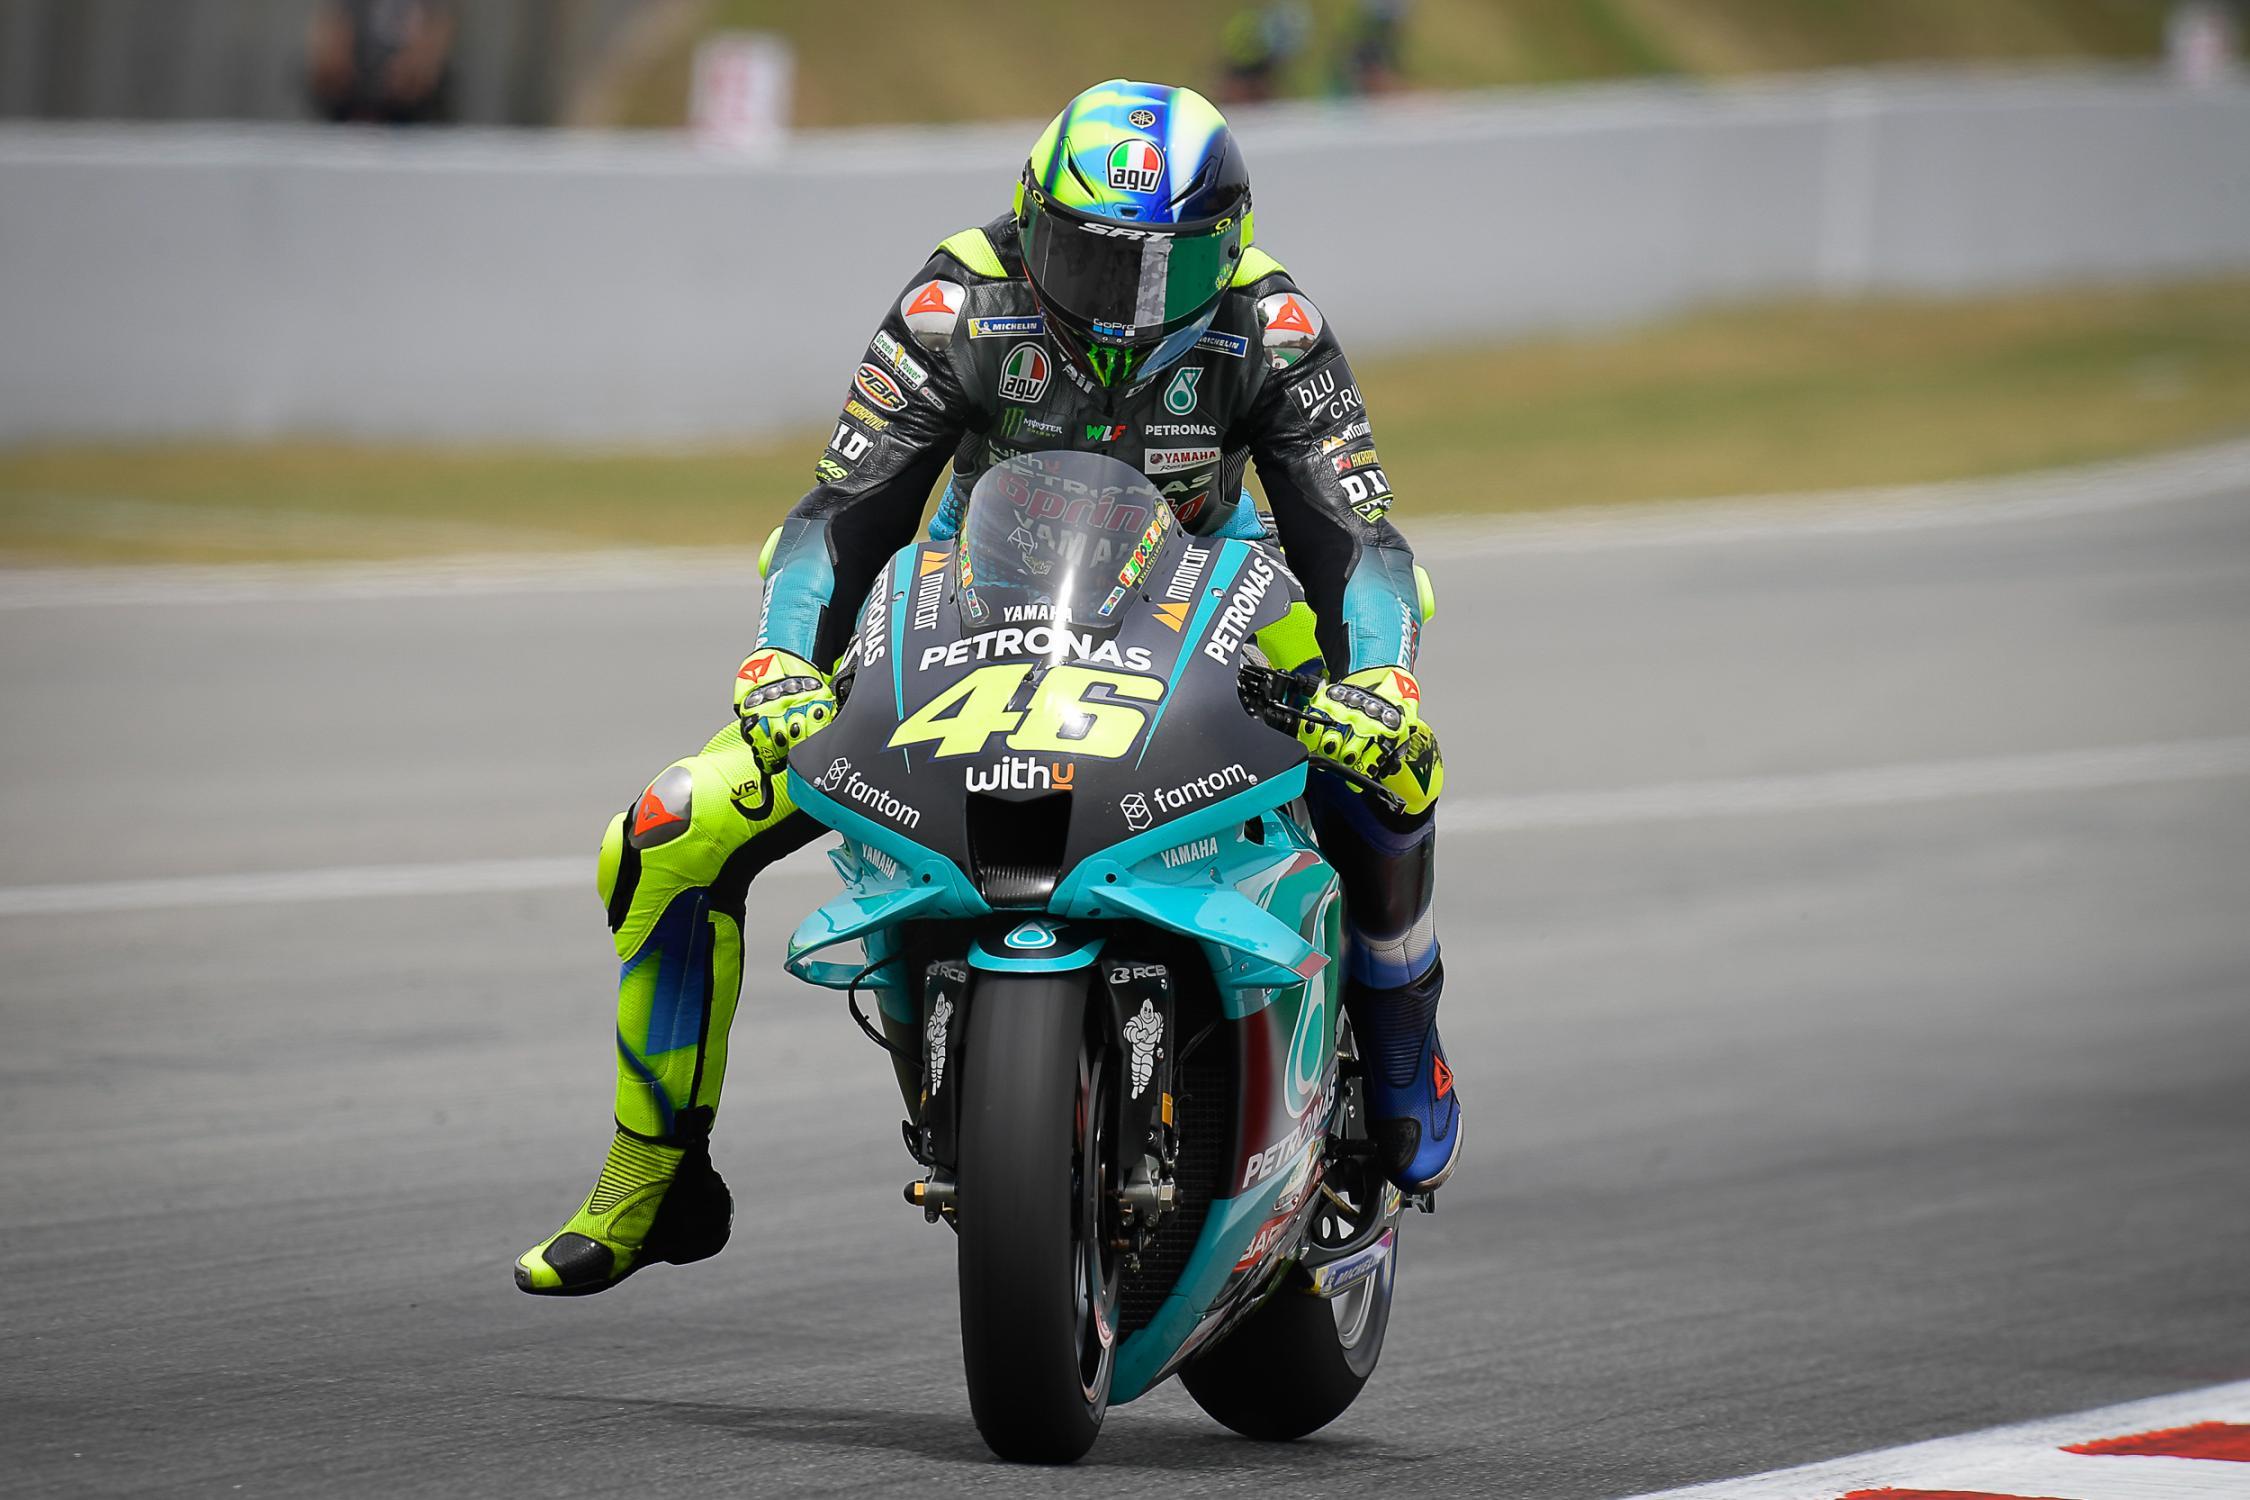 MOTO GRAND PRIX DES PAYS BAS 2021 Valentino-rossi-catalogne-motogp-2021-3